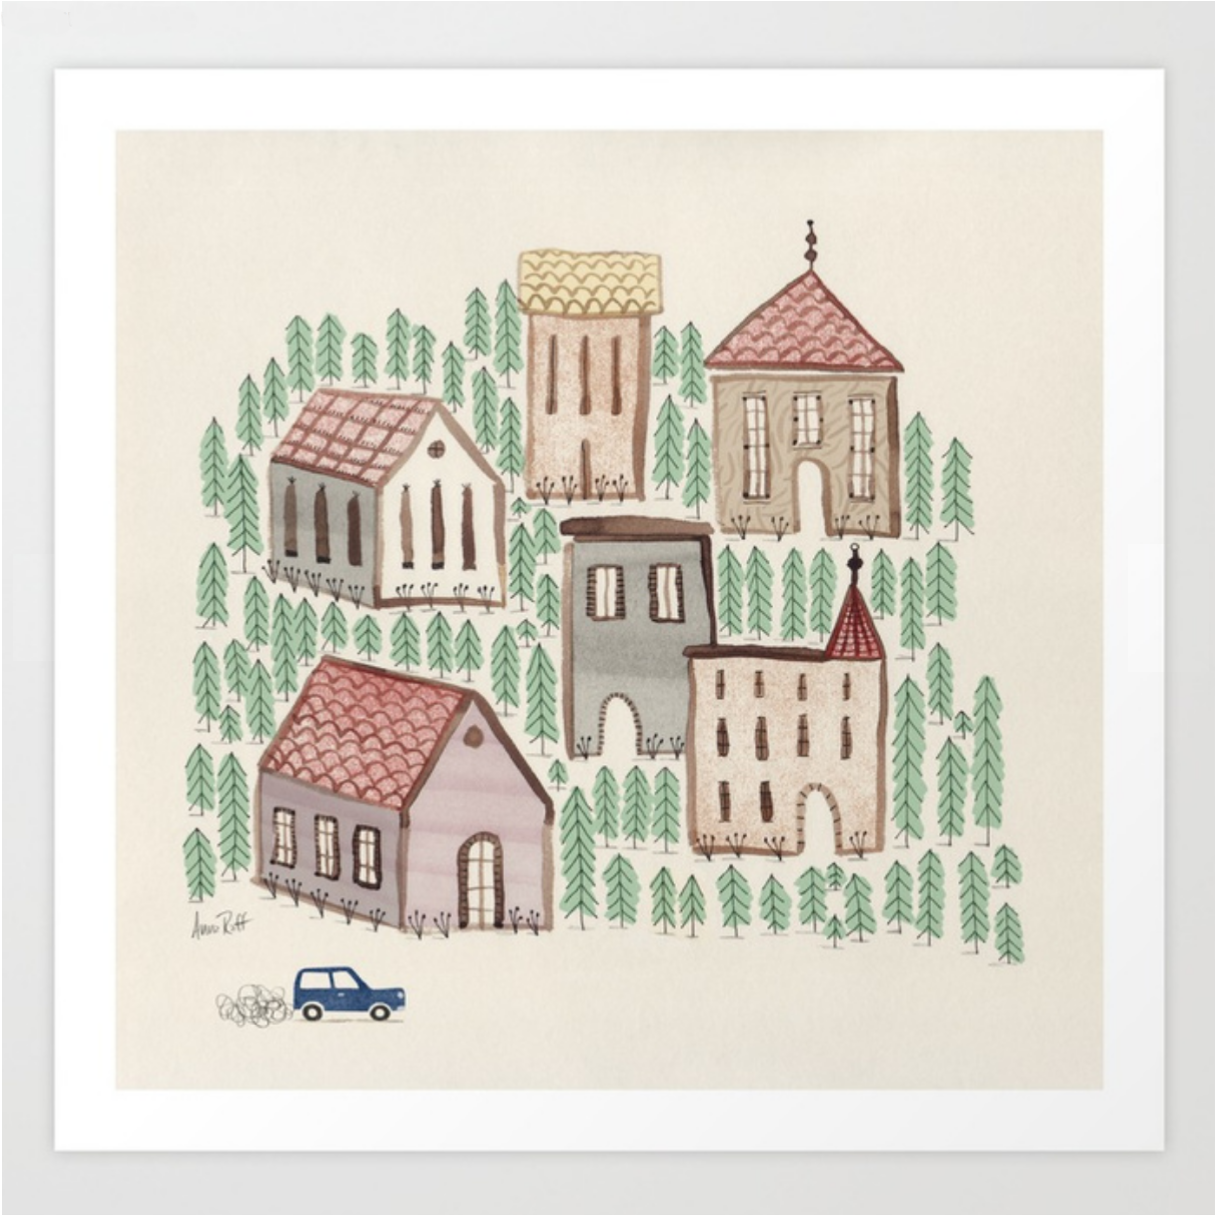 The Village print